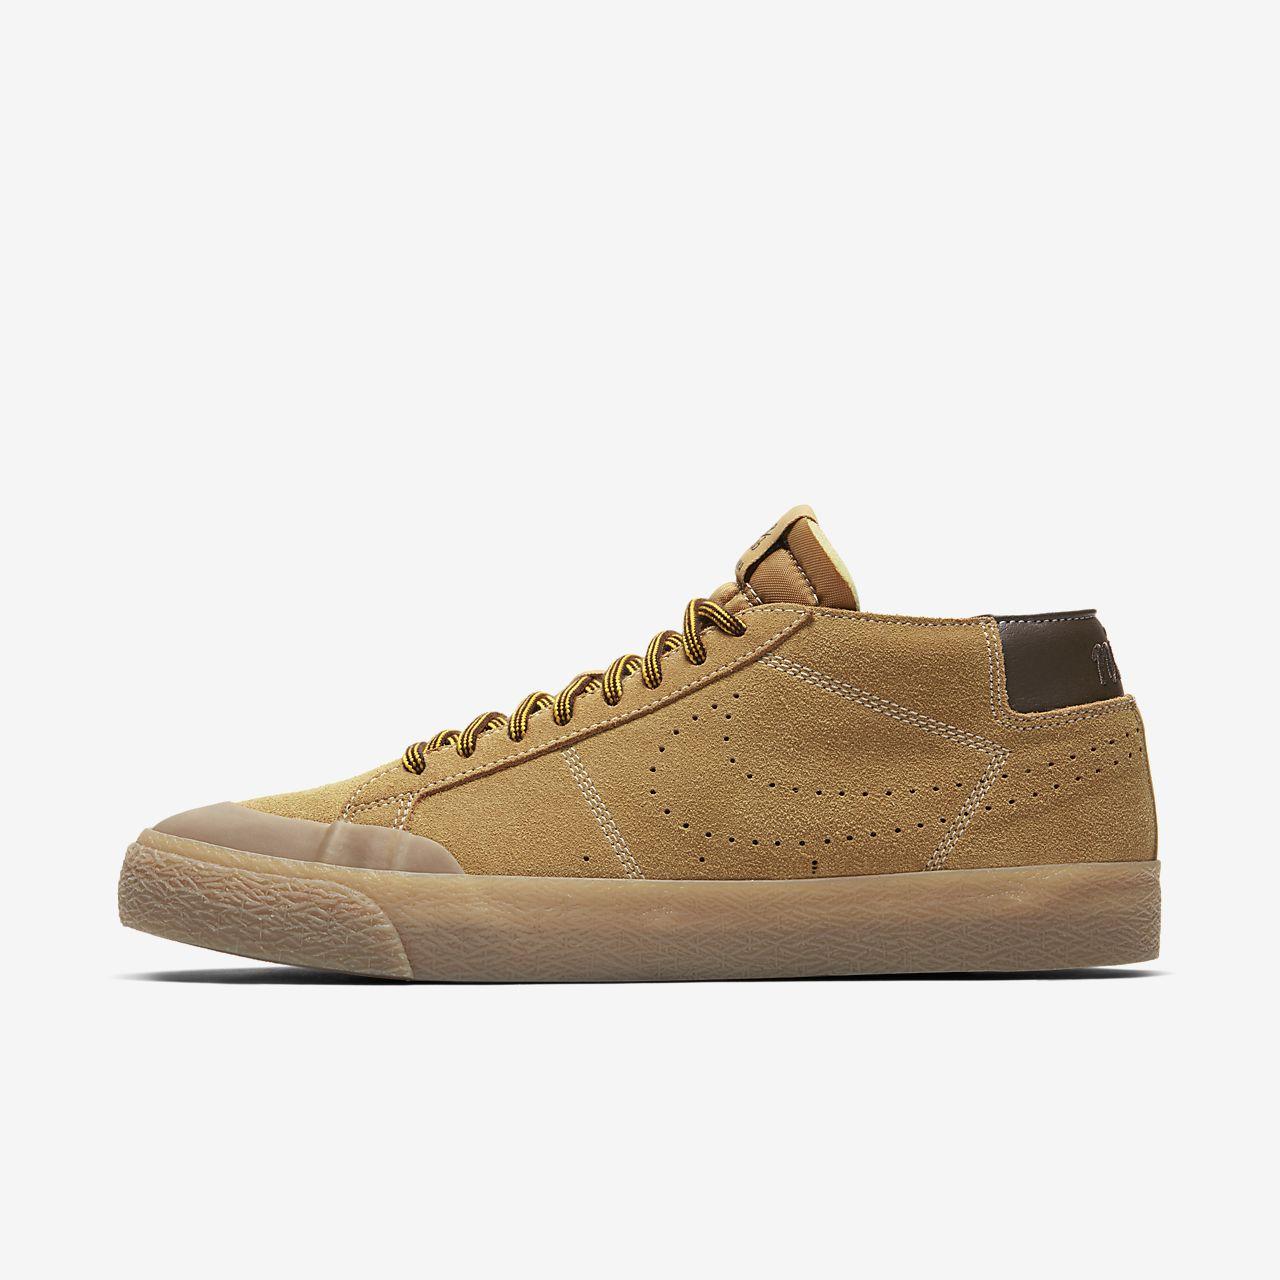 Skateboardsko Nike SB Zoom Blazer Chukka XT Premium